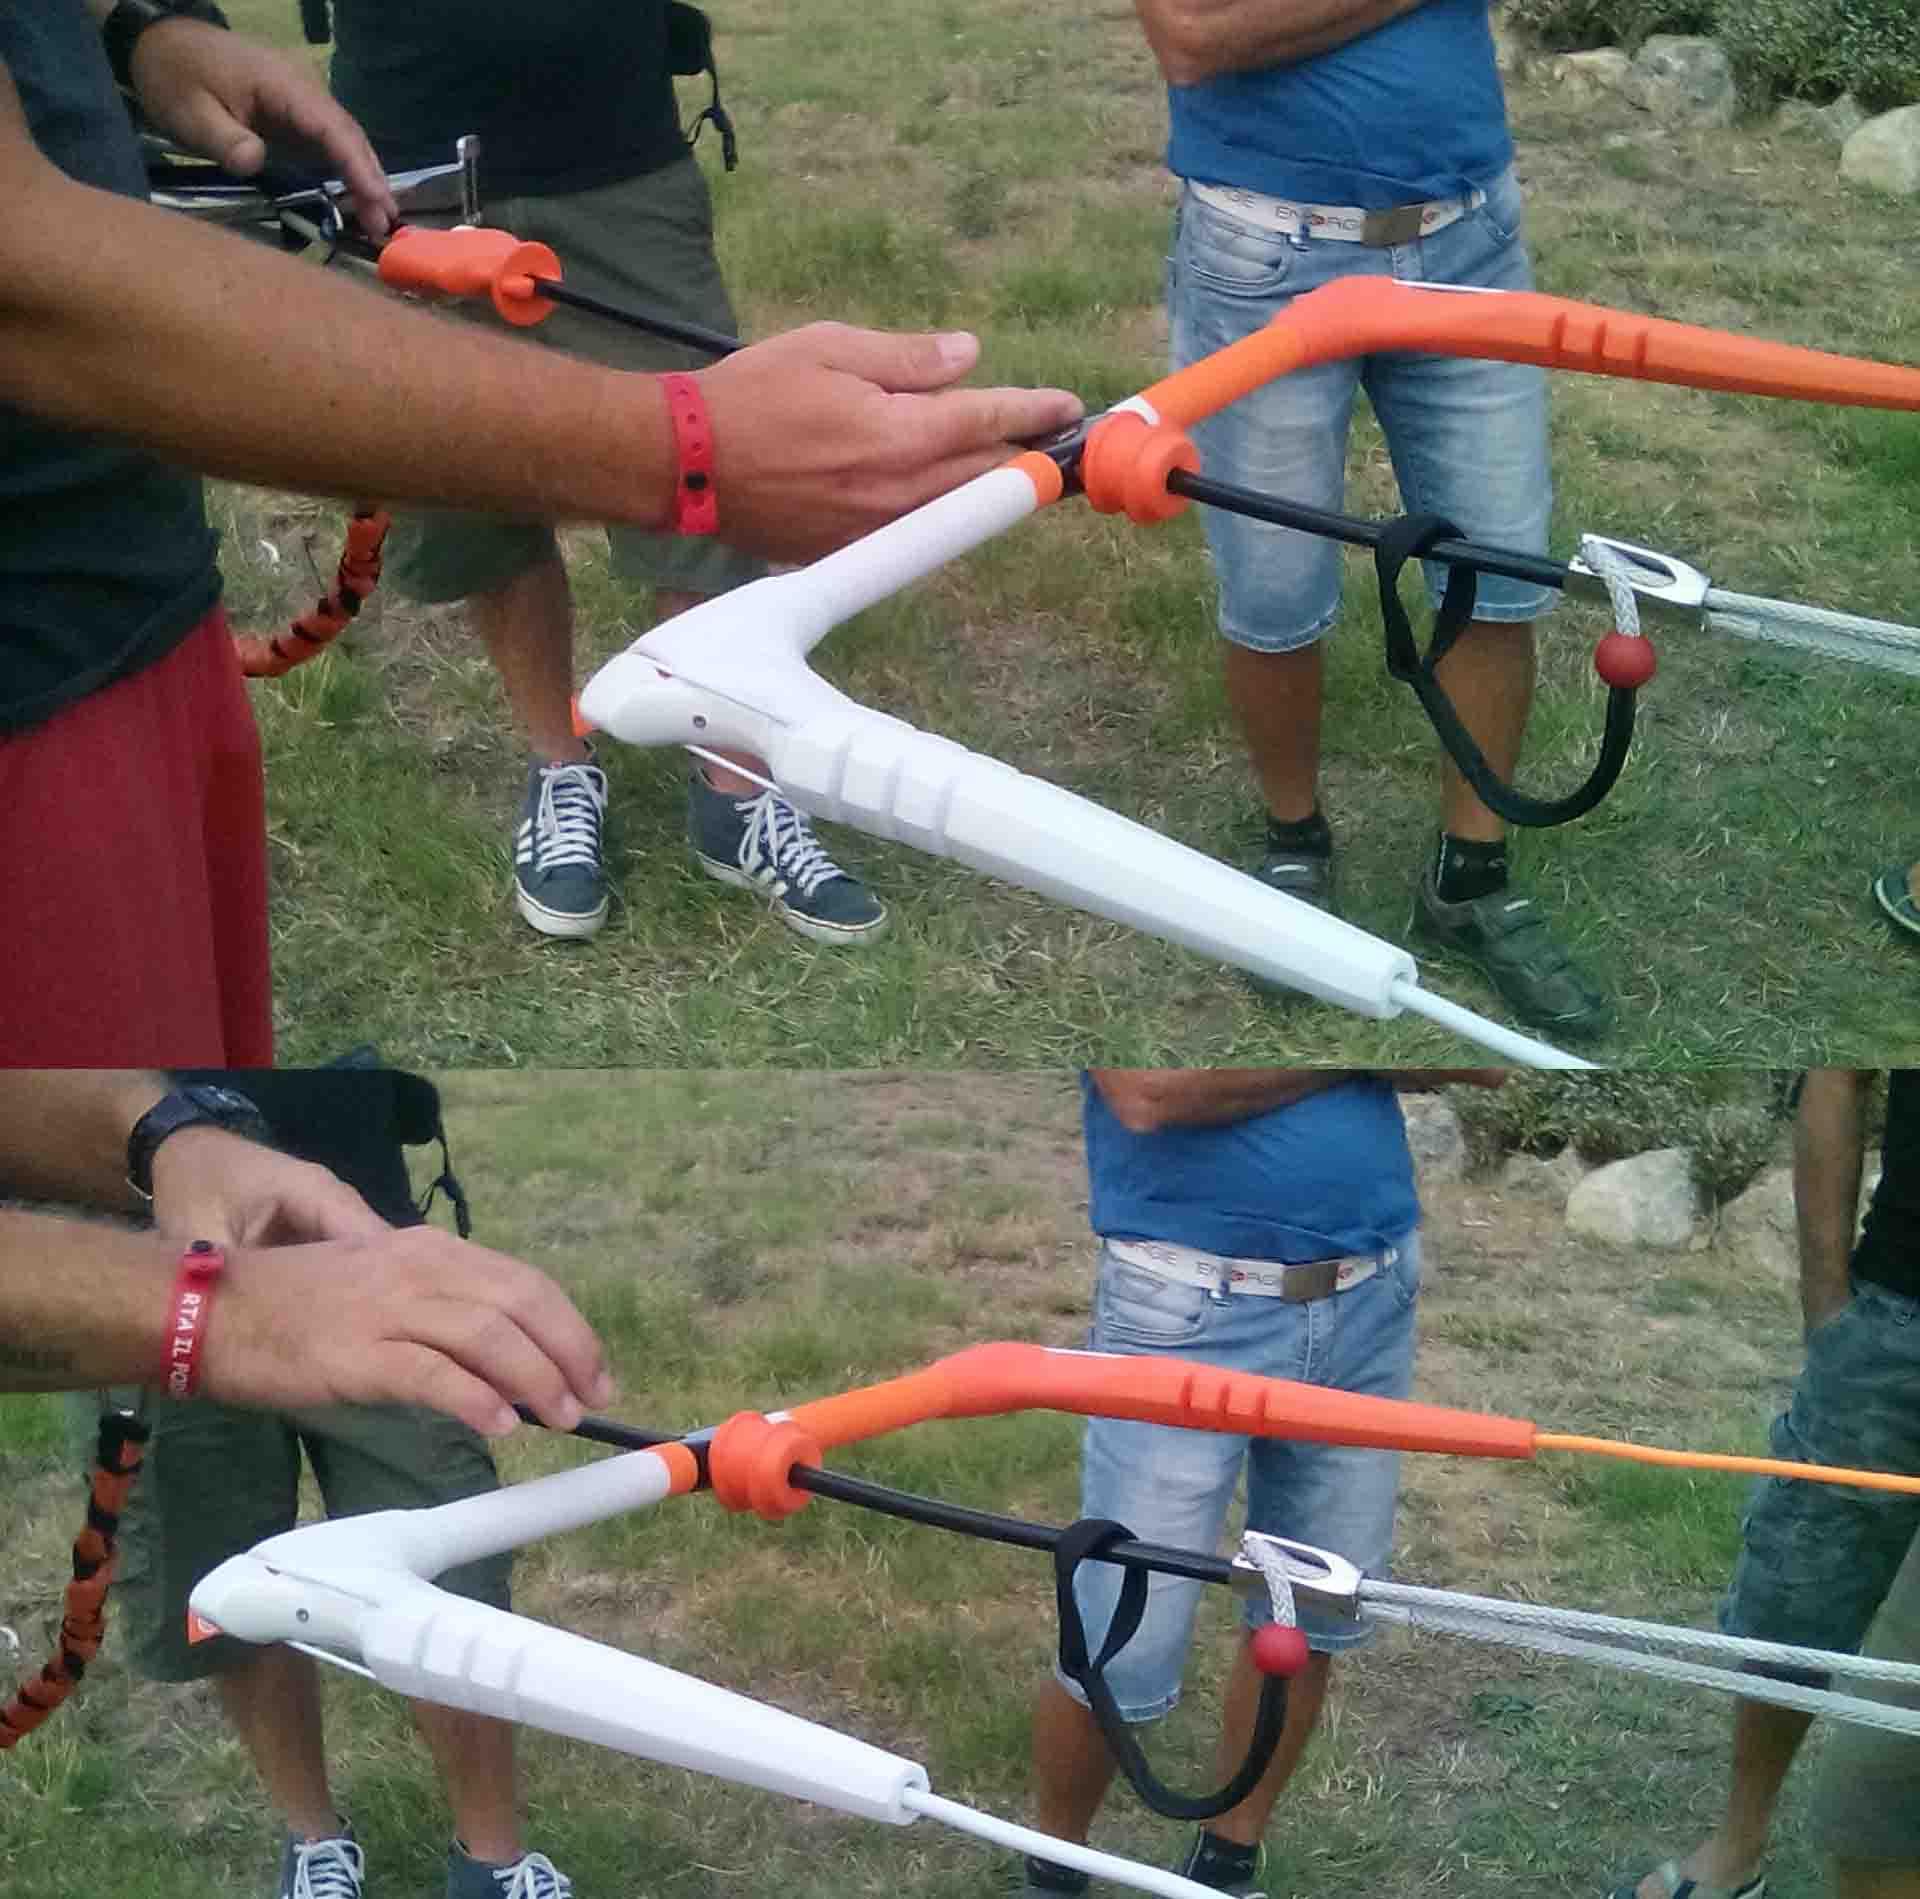 Kitesurf-bar-stopper-rrd-bar-v7-2016-news-novita-kite-nuovi-roberto-ricci-designs